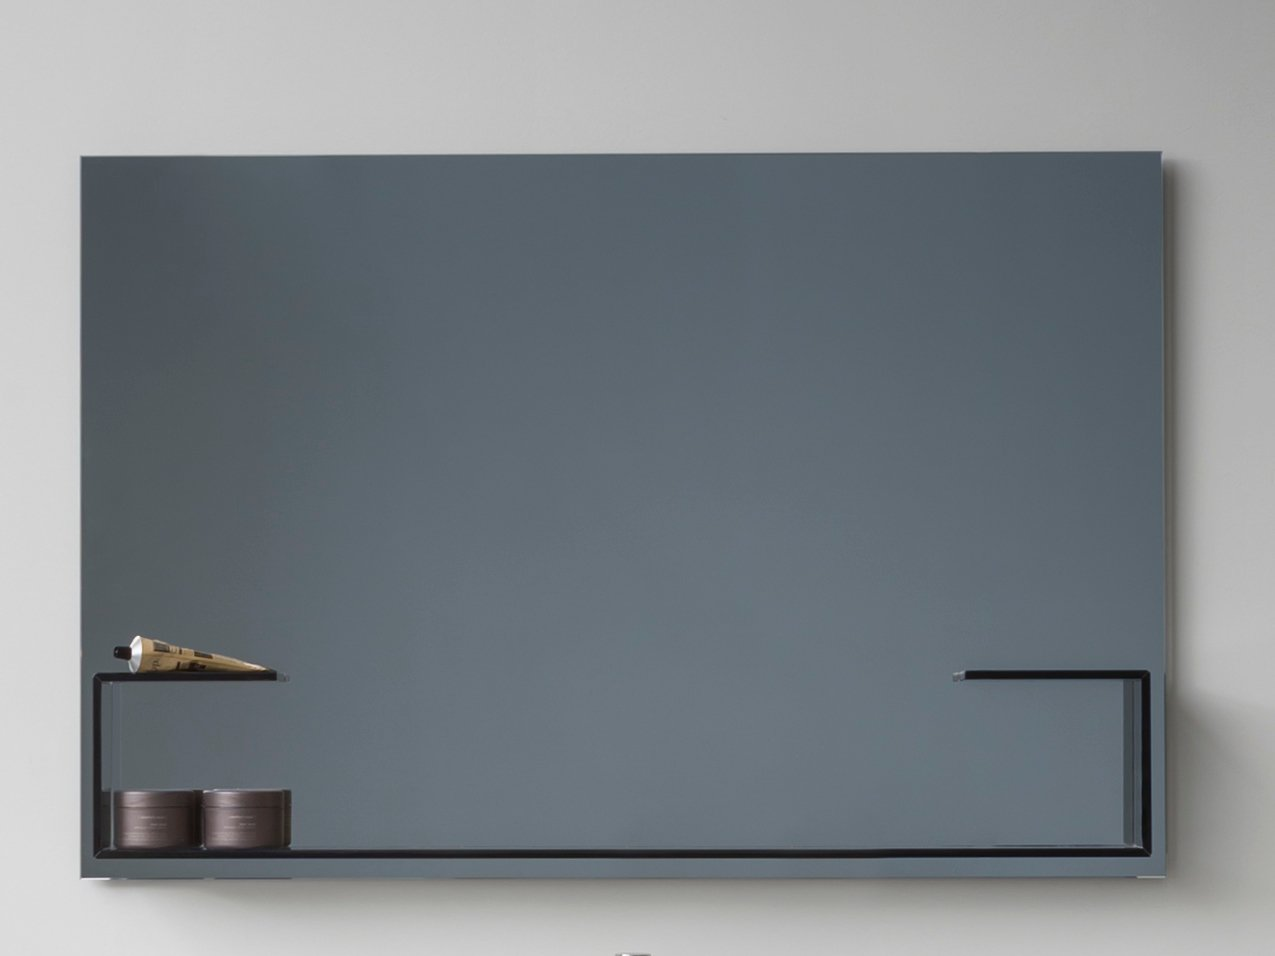 Stunning Specchi Bagno Design Pictures - bakeroffroad.us ...